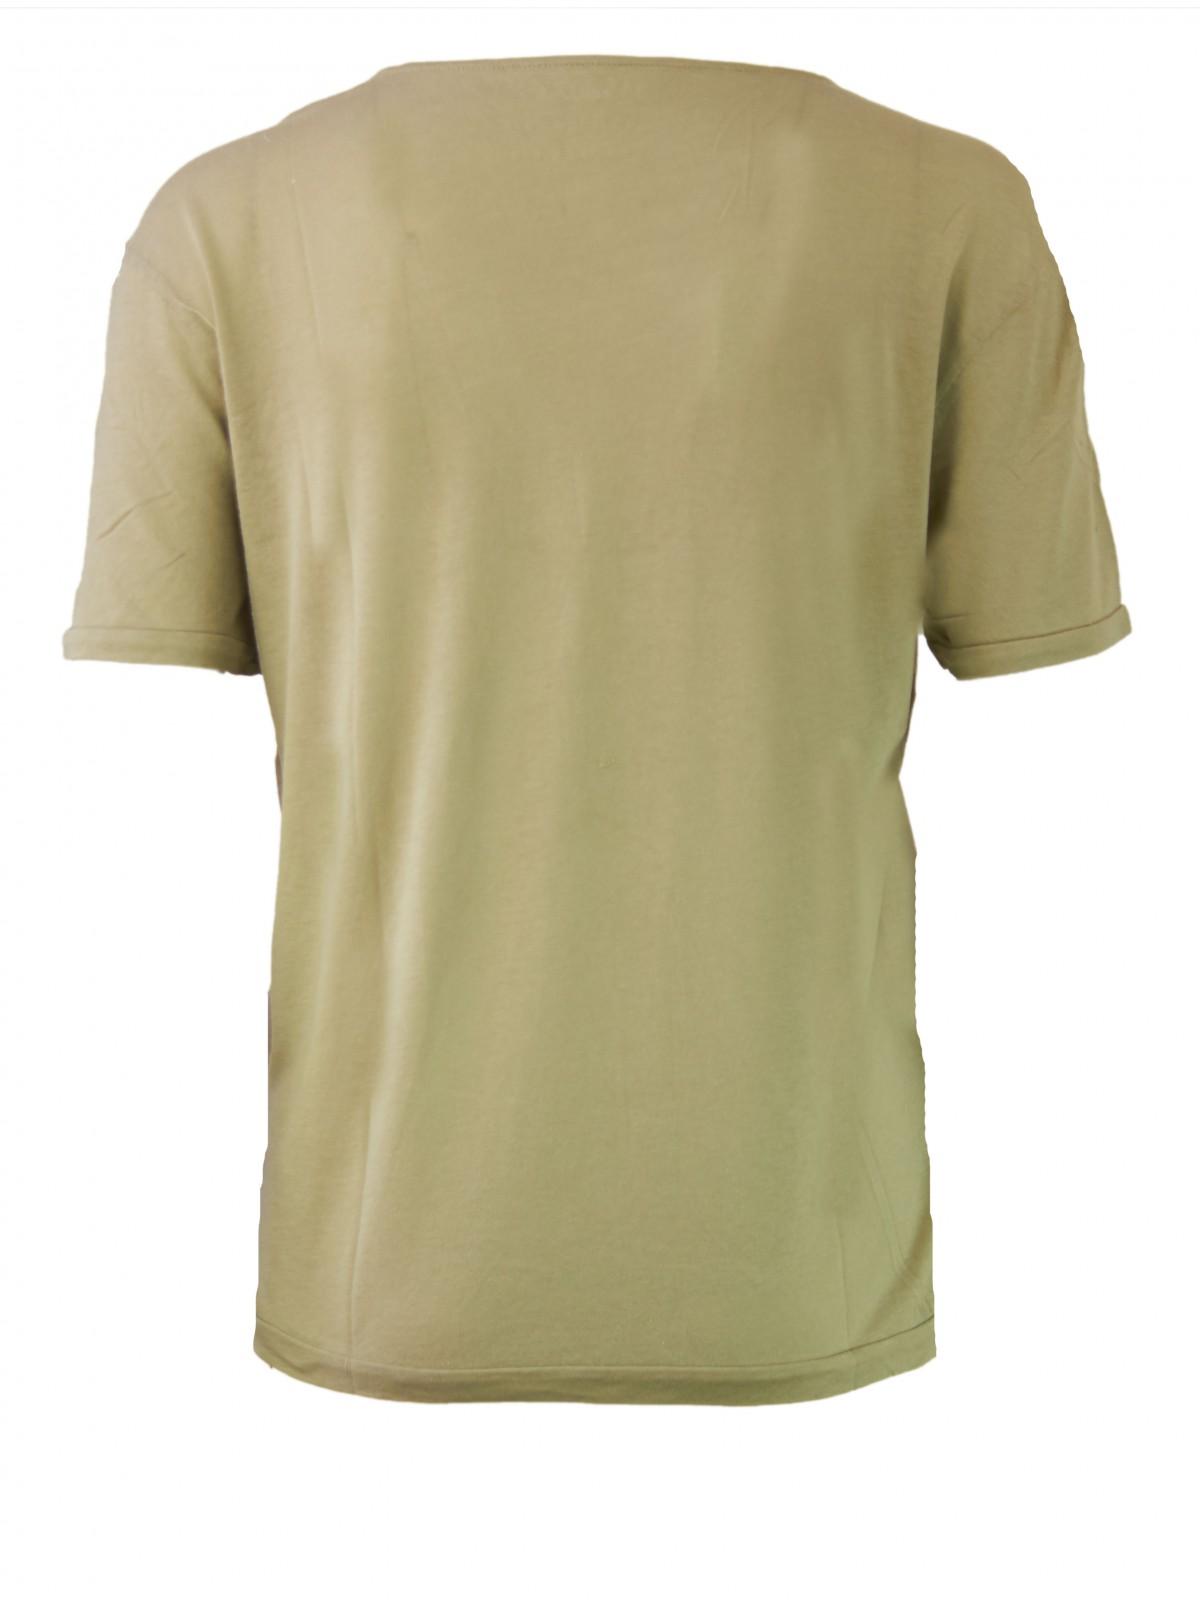 Larissa Wickel Shirt in Desert